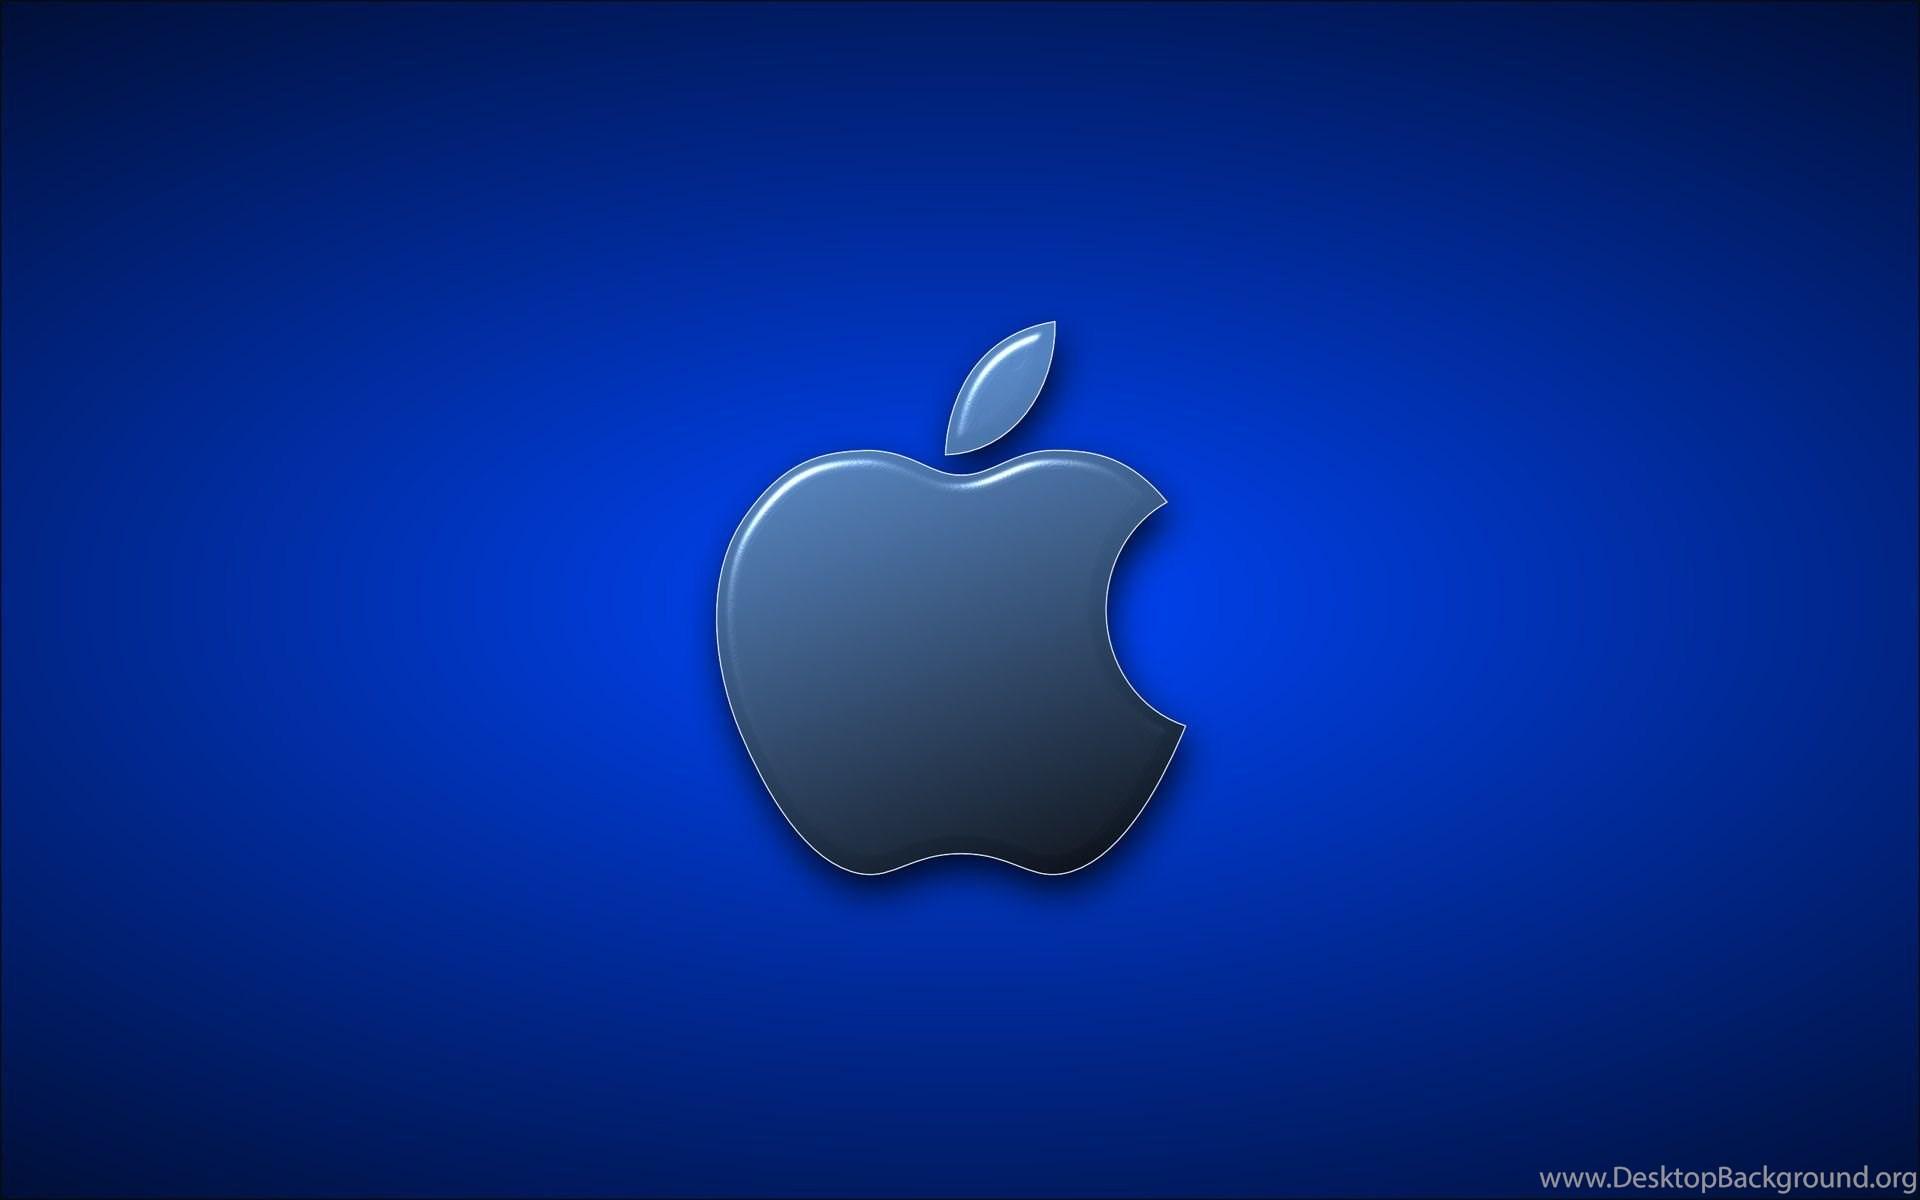 20 Elegant Apple Mac Hd Wallpapers Set 3 Wallpapers Techmynd Images, Photos, Reviews